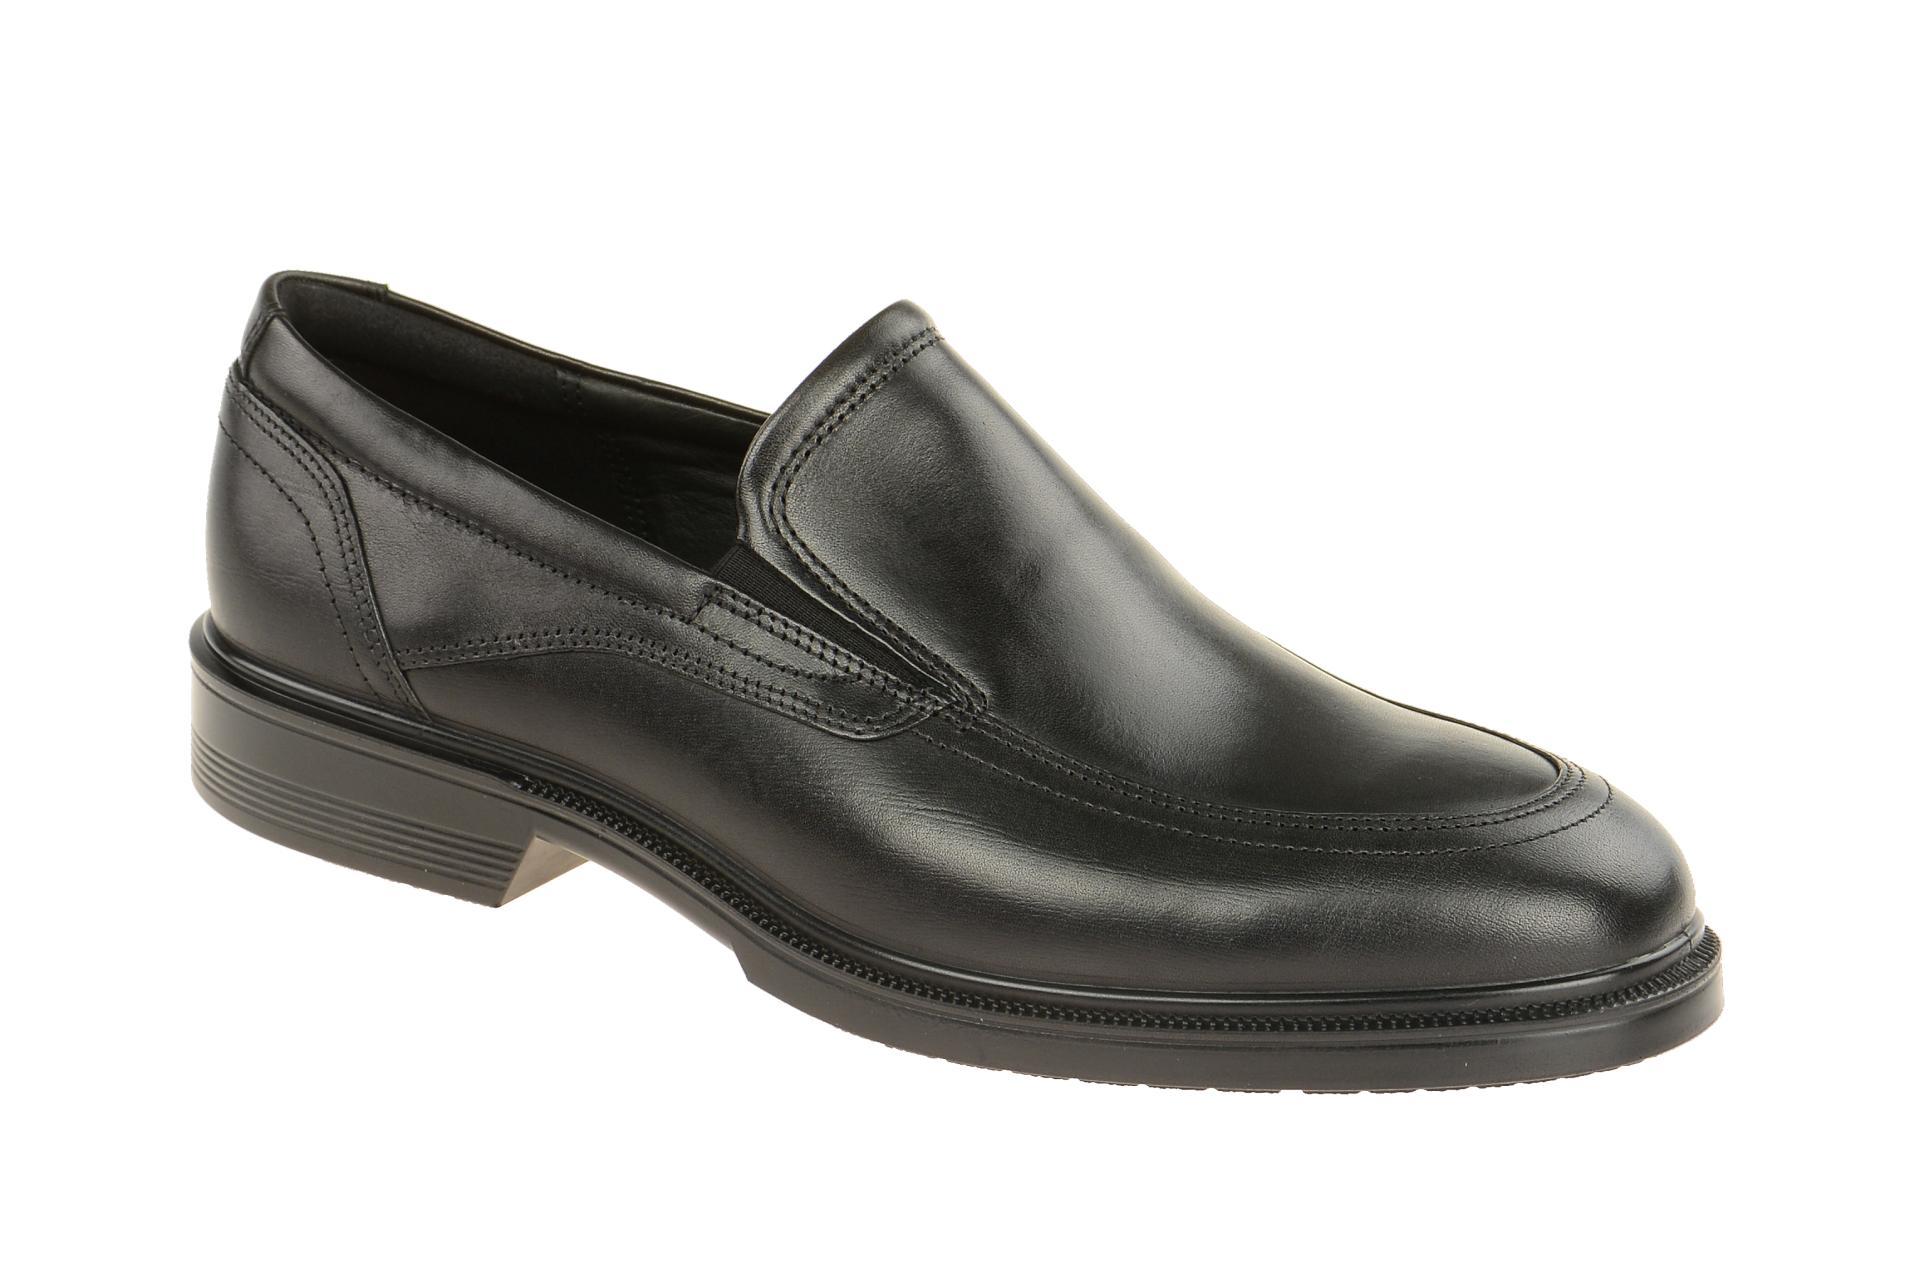 ecco Lisbon Schuhe schwarz Slipper